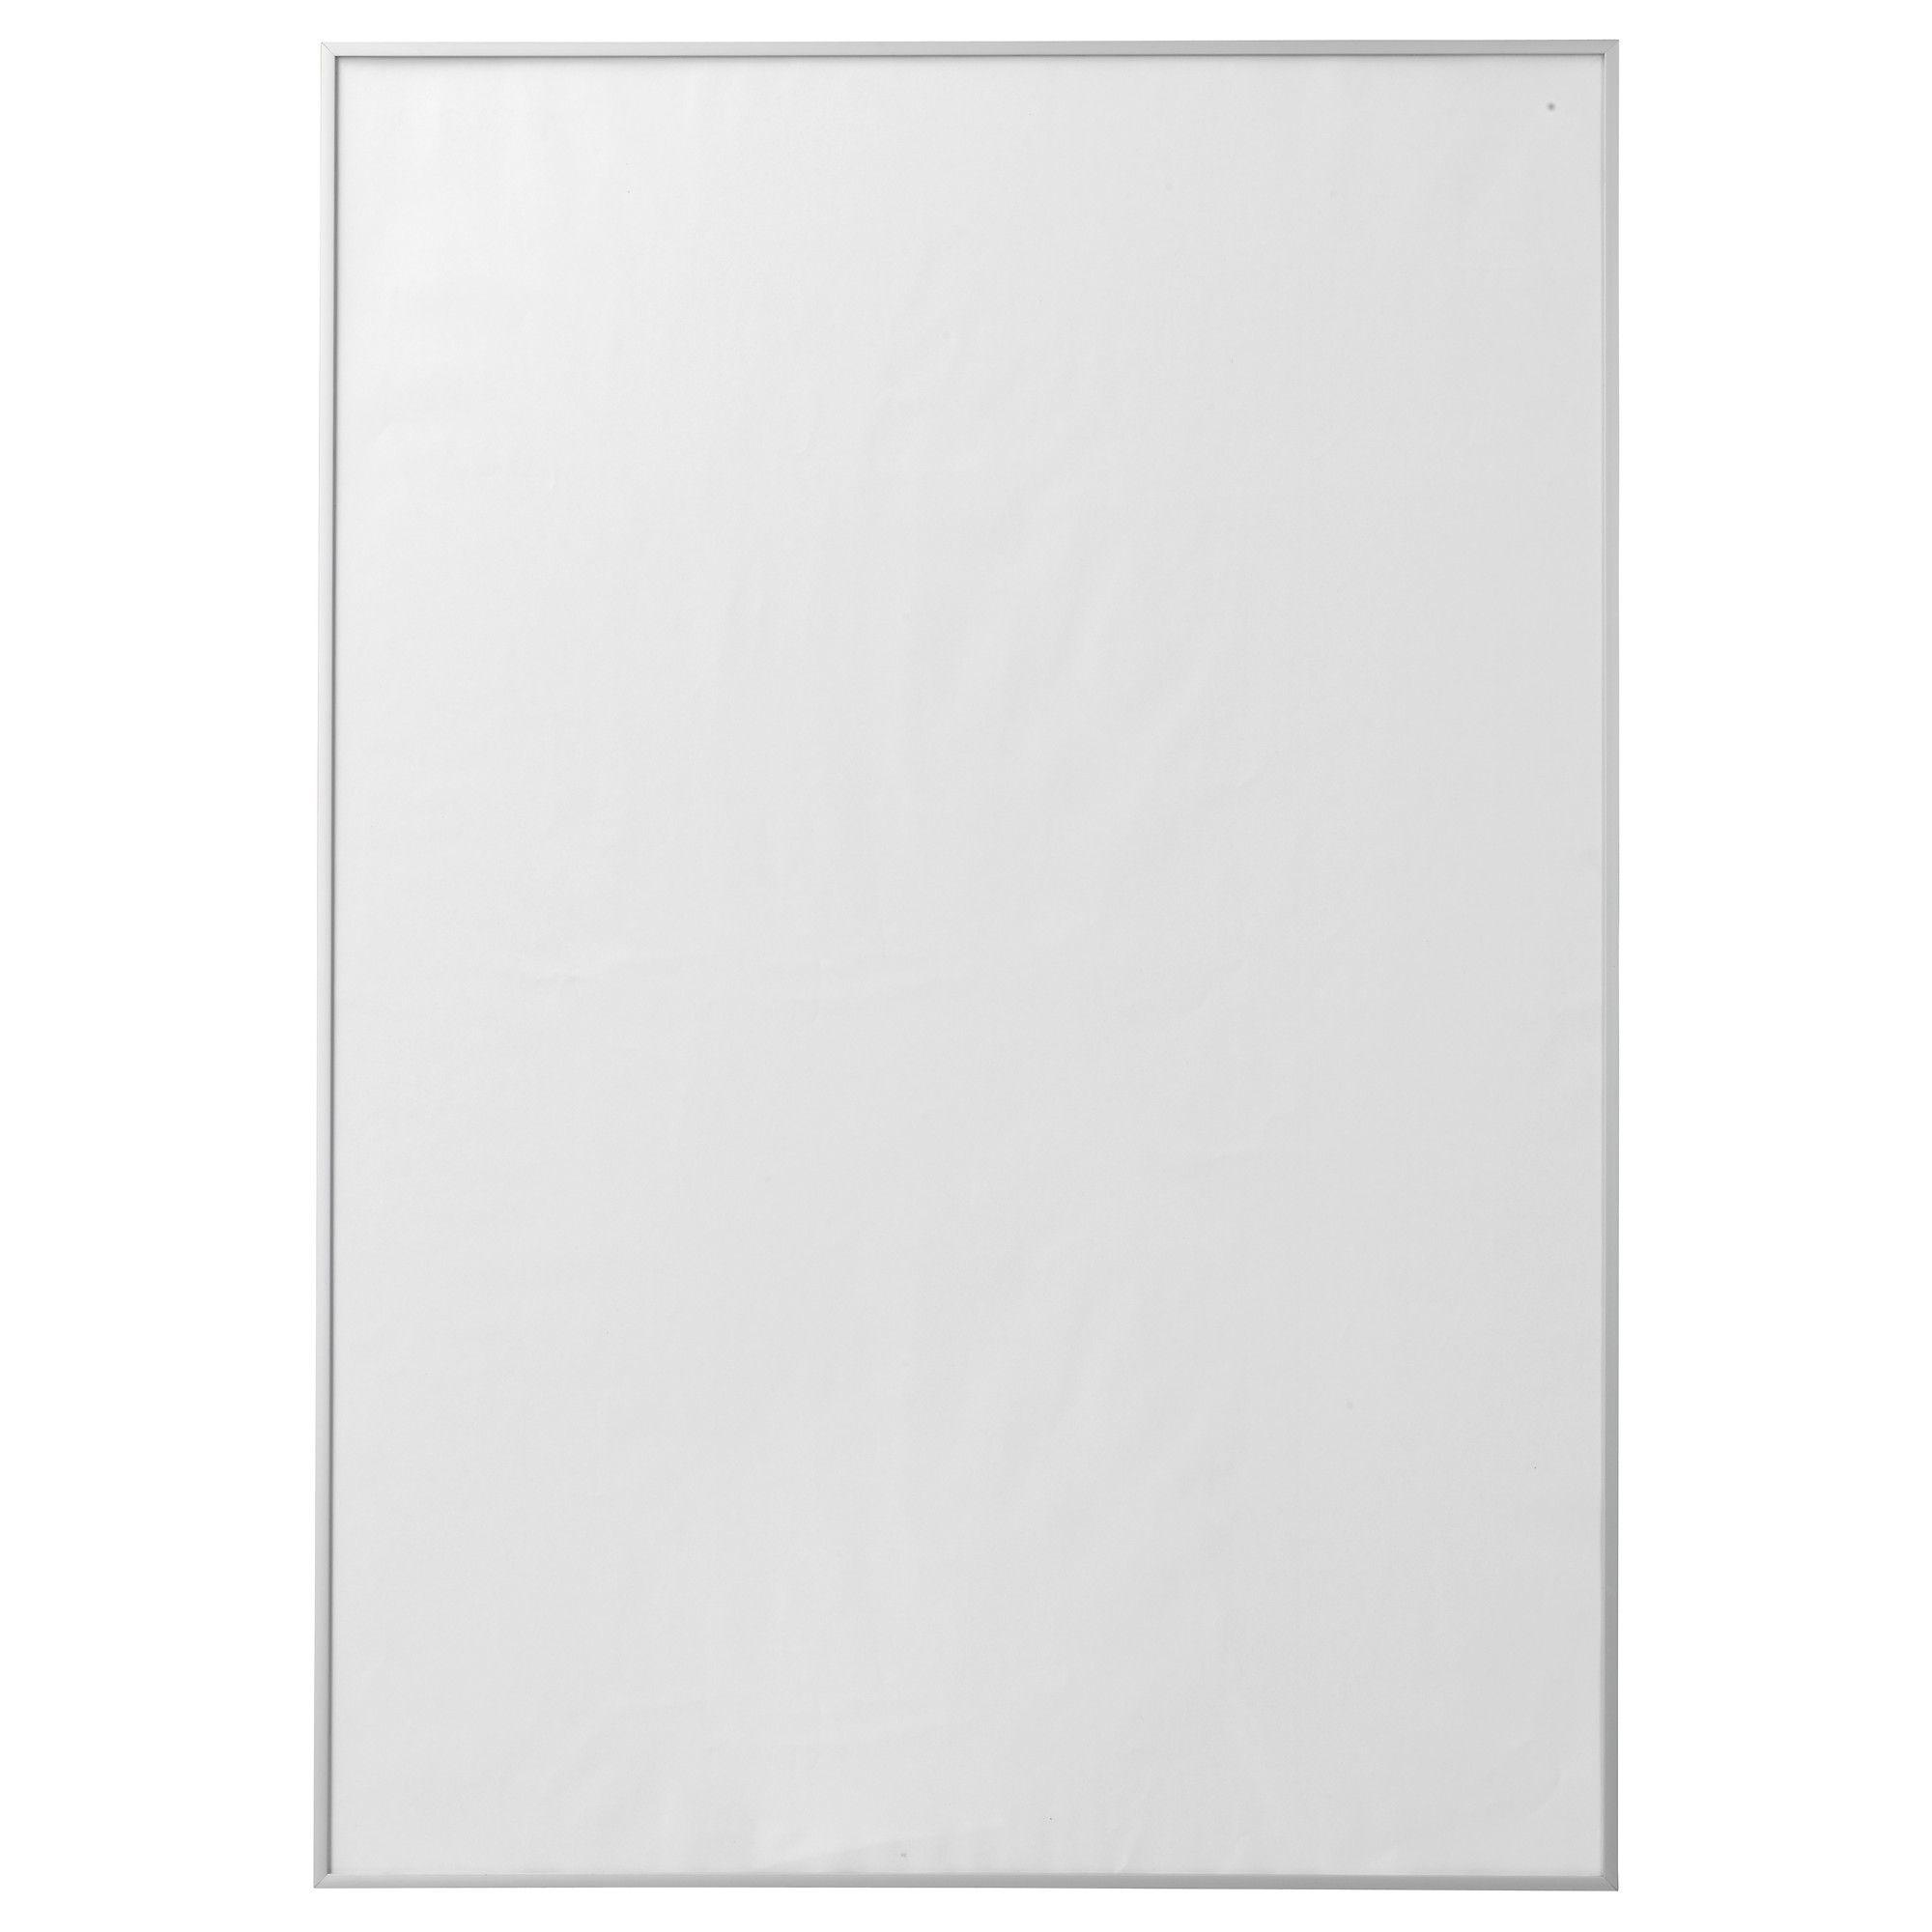 Ikea Australia Affordable Swedish Home Furniture Ikea Bath Panel Bathroom Space